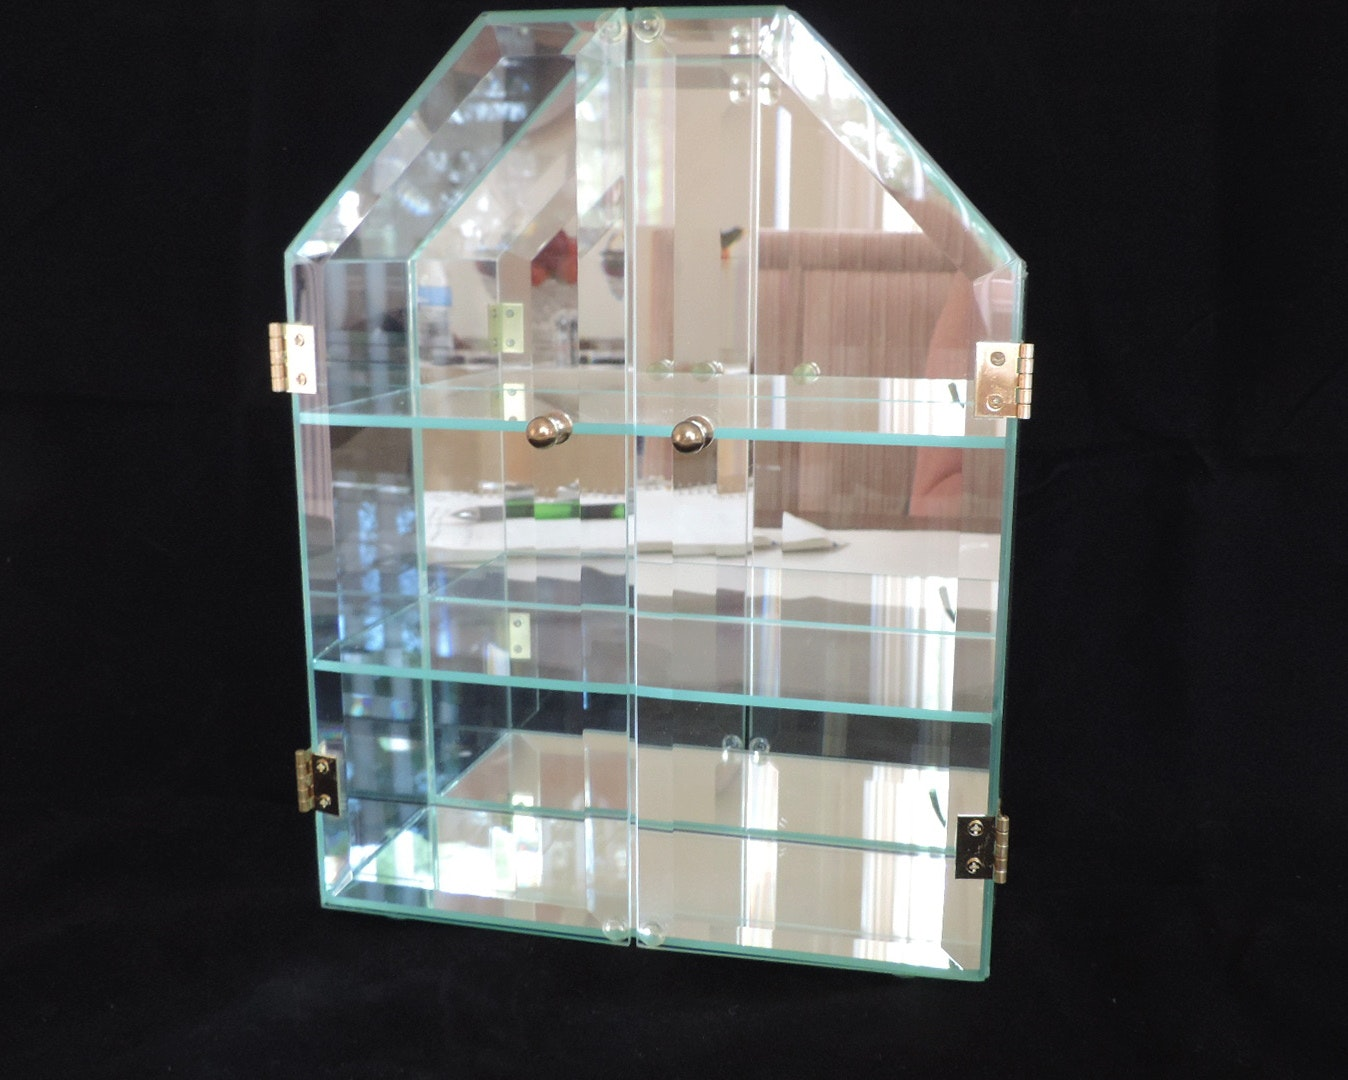 Swarovski Crystal Miniature Figurines And Display Case Ebth